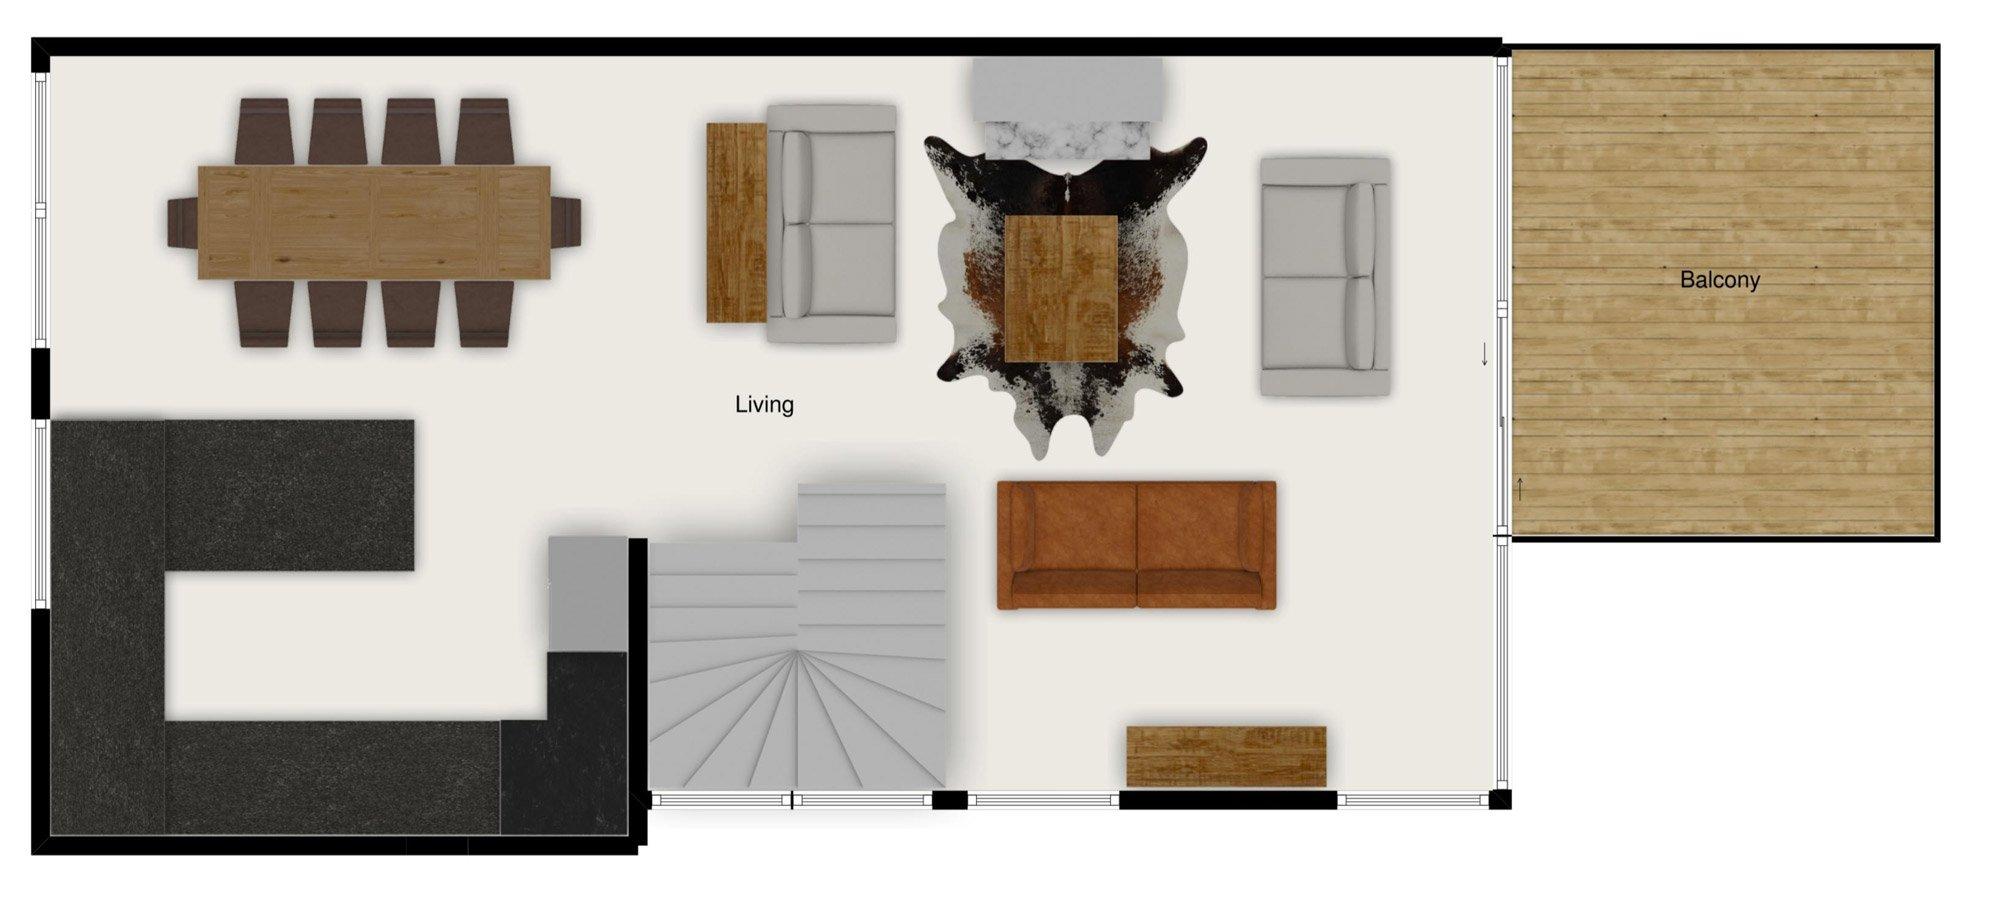 Floor plans of Chalet Le Pic Blanc in St Martin de Belleville - Second floor